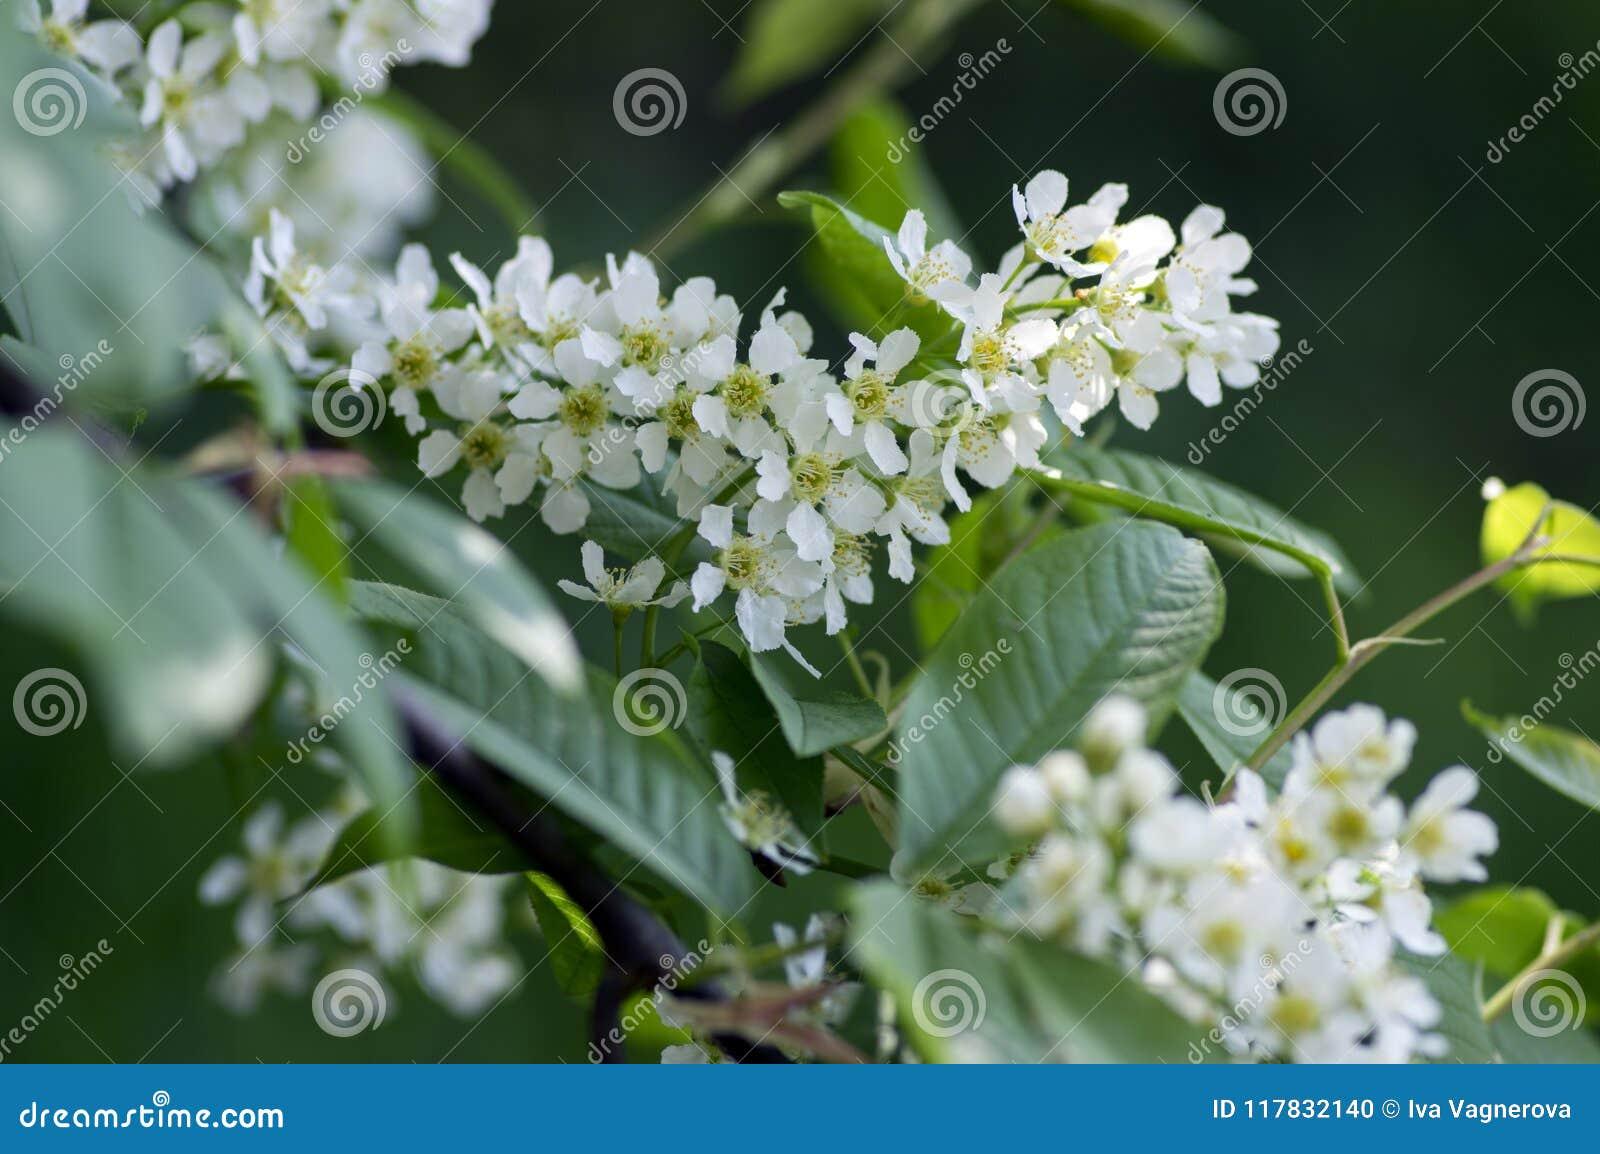 Prunus padus bird cherry tree blooming during spring group of small download prunus padus bird cherry tree blooming during spring group of small white flowers and mightylinksfo